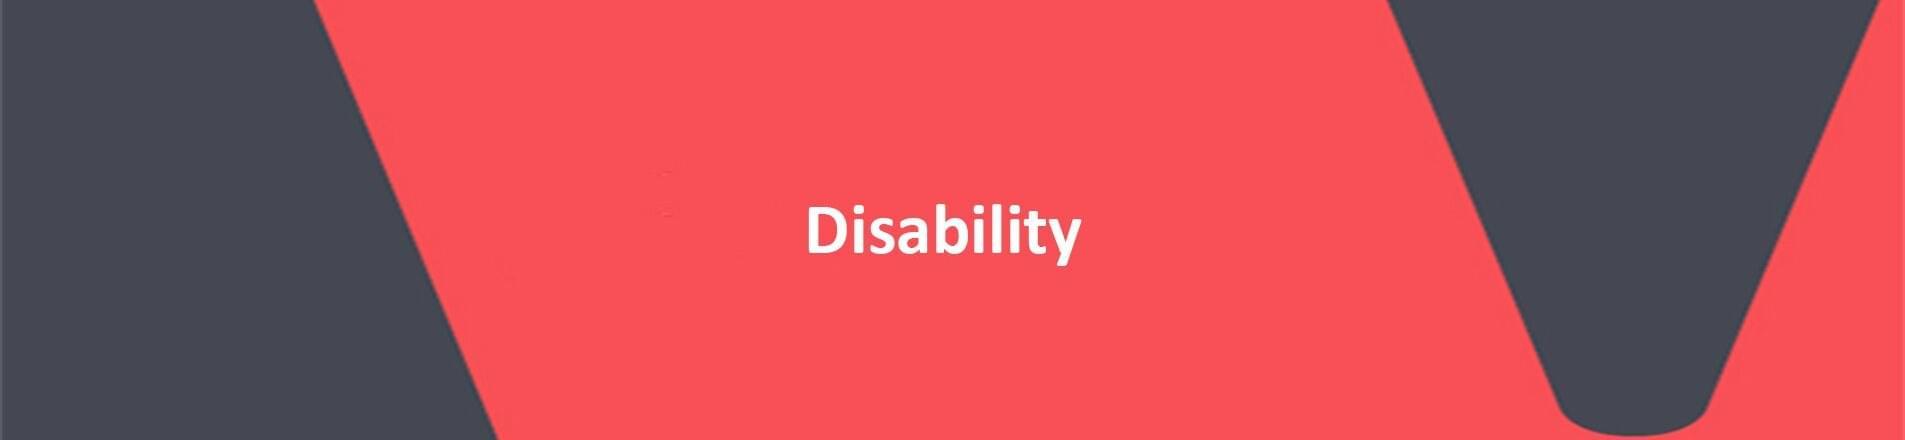 Disability coco-cola